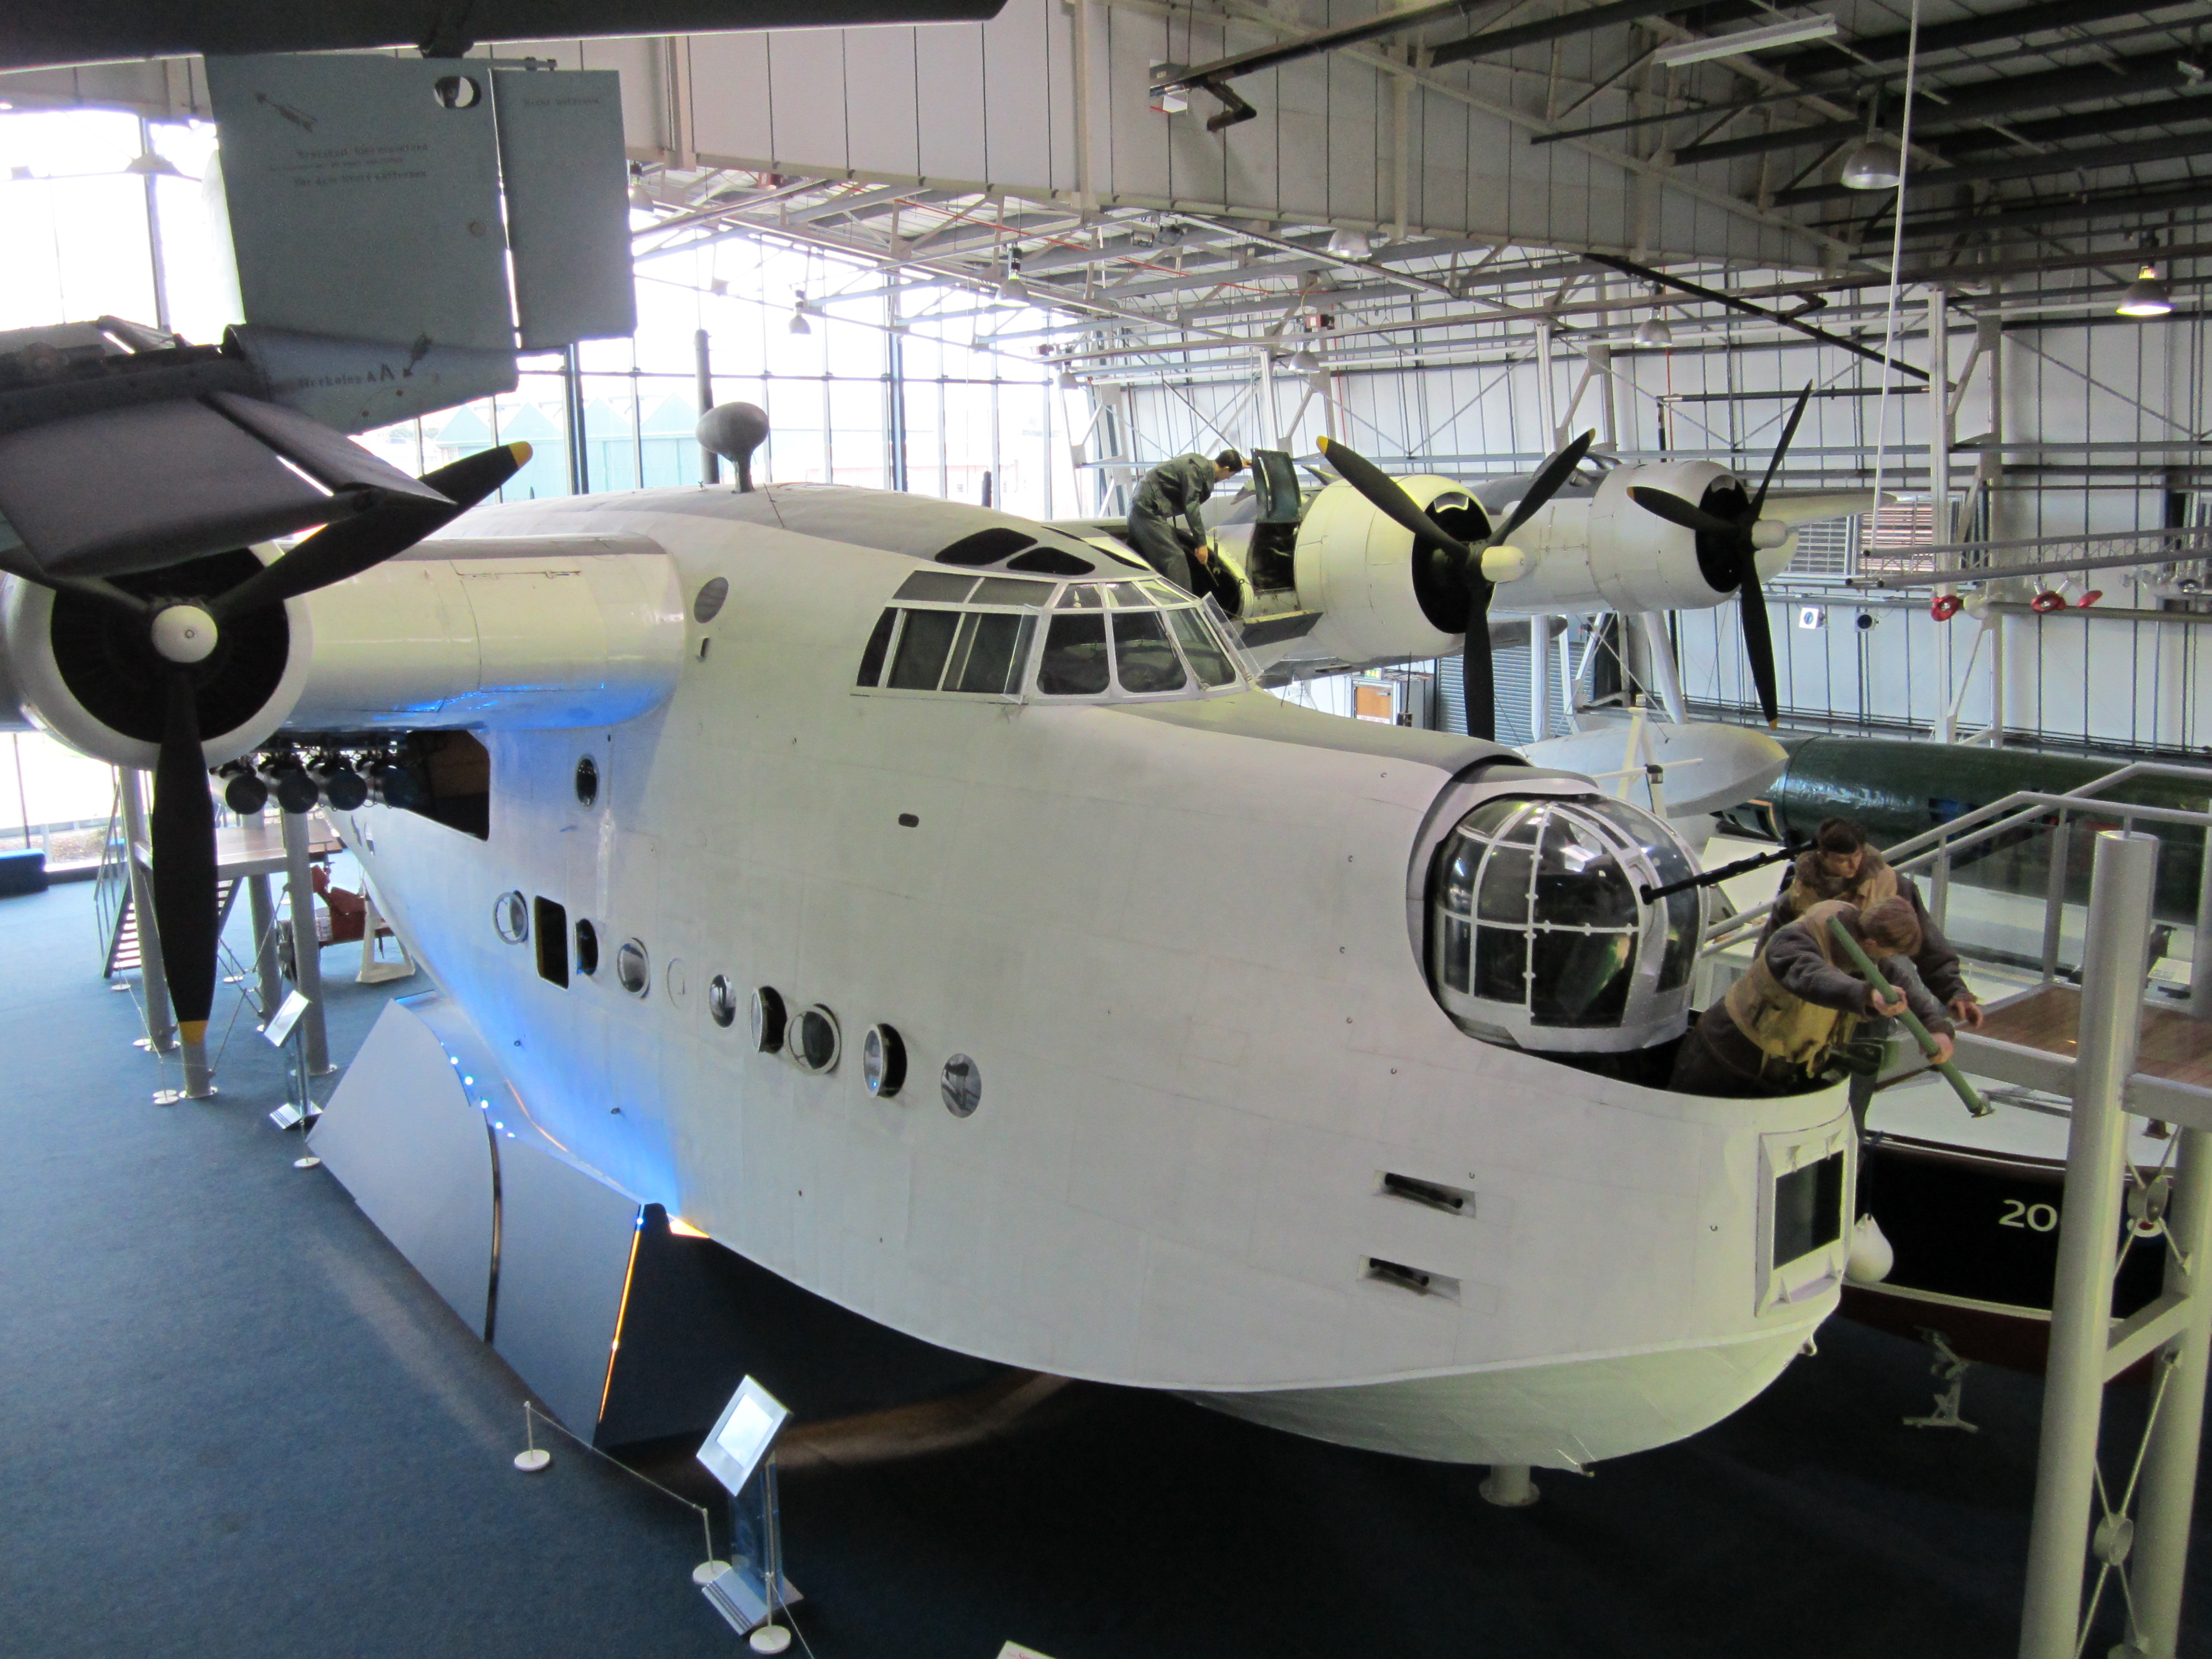 sunderland flying short sunderland short aircraft aircraft military ...